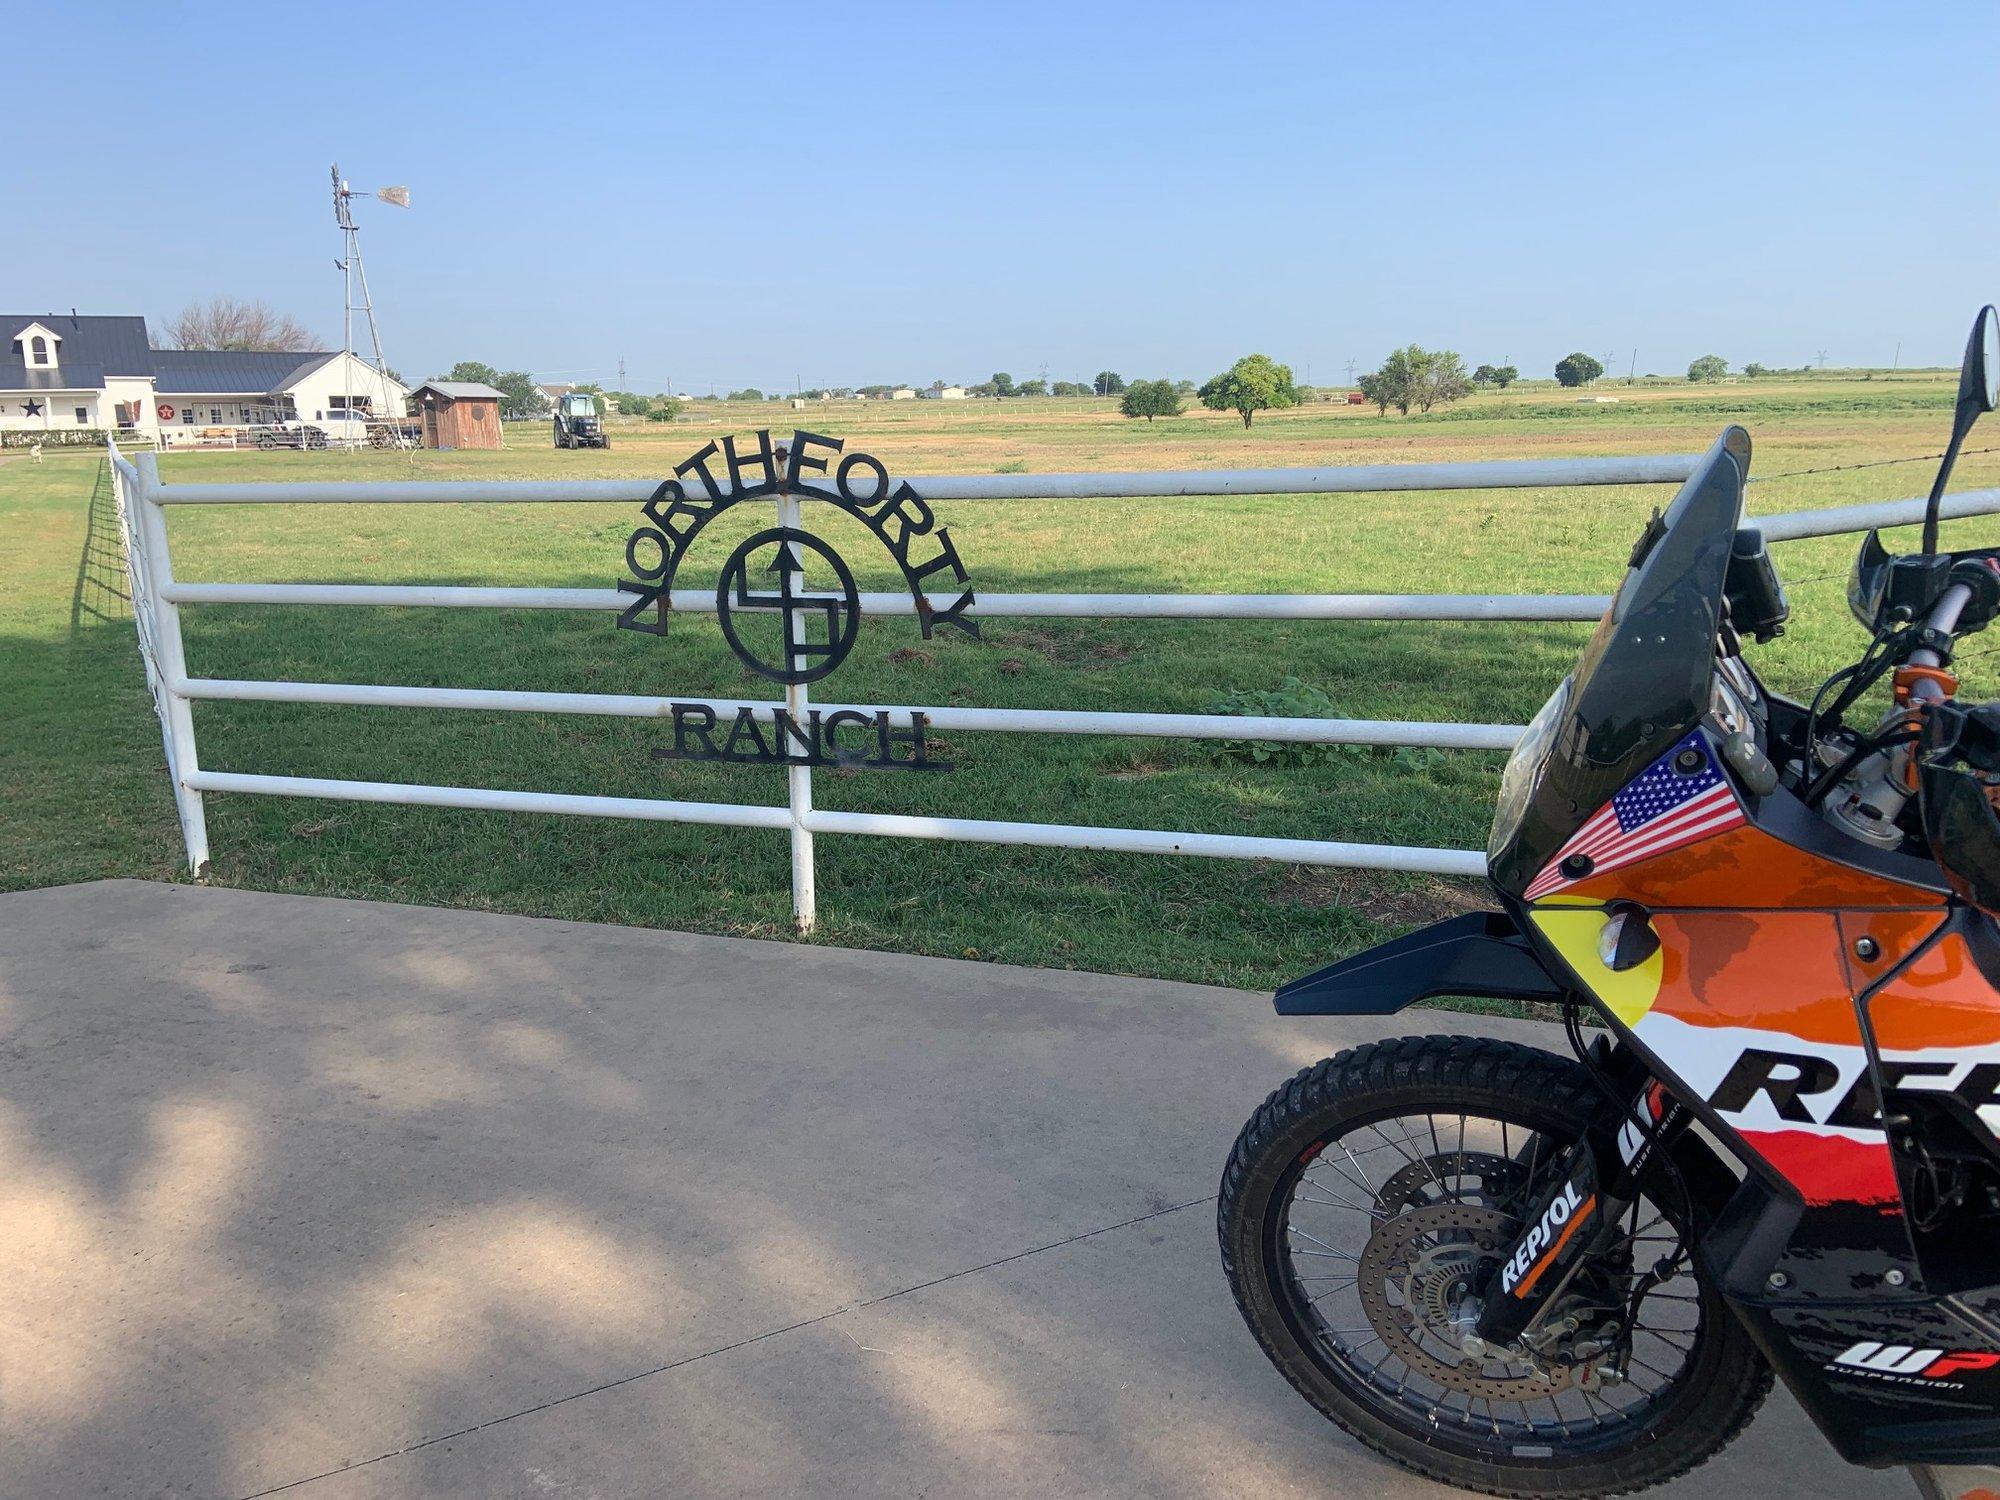 North Forty Ranch.jpg